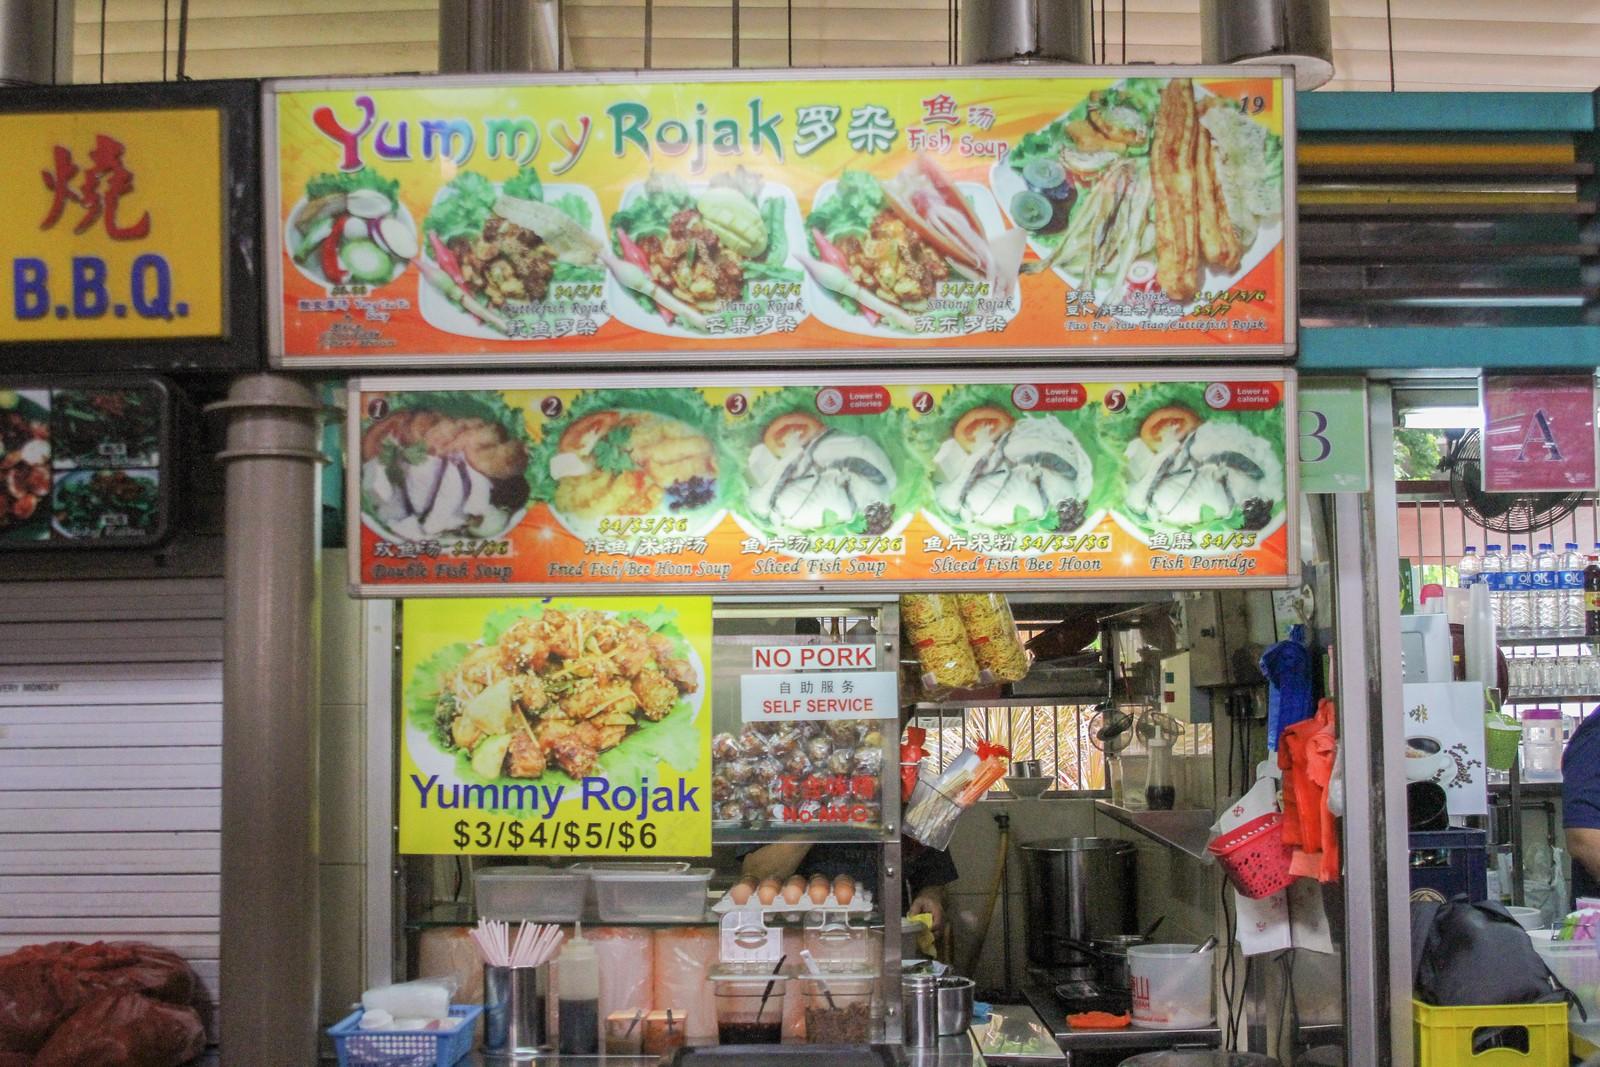 Adam Road Food Centre - Yummy Rojak